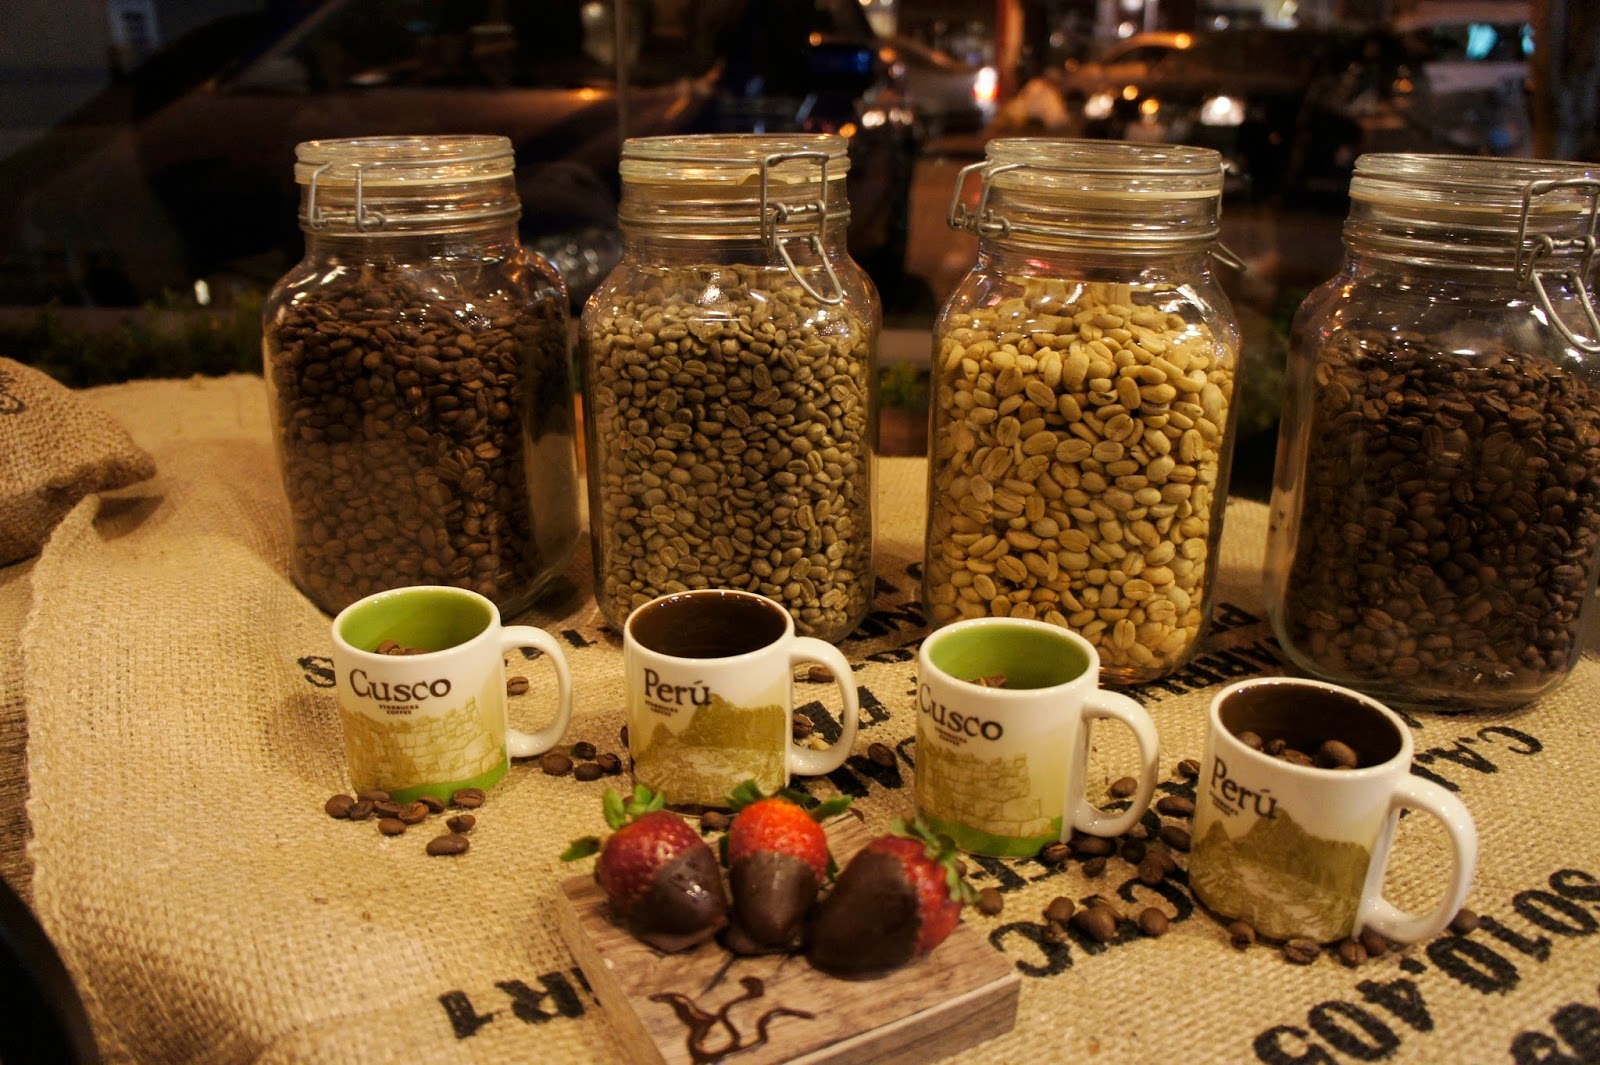 Café Peruano, Starbucks